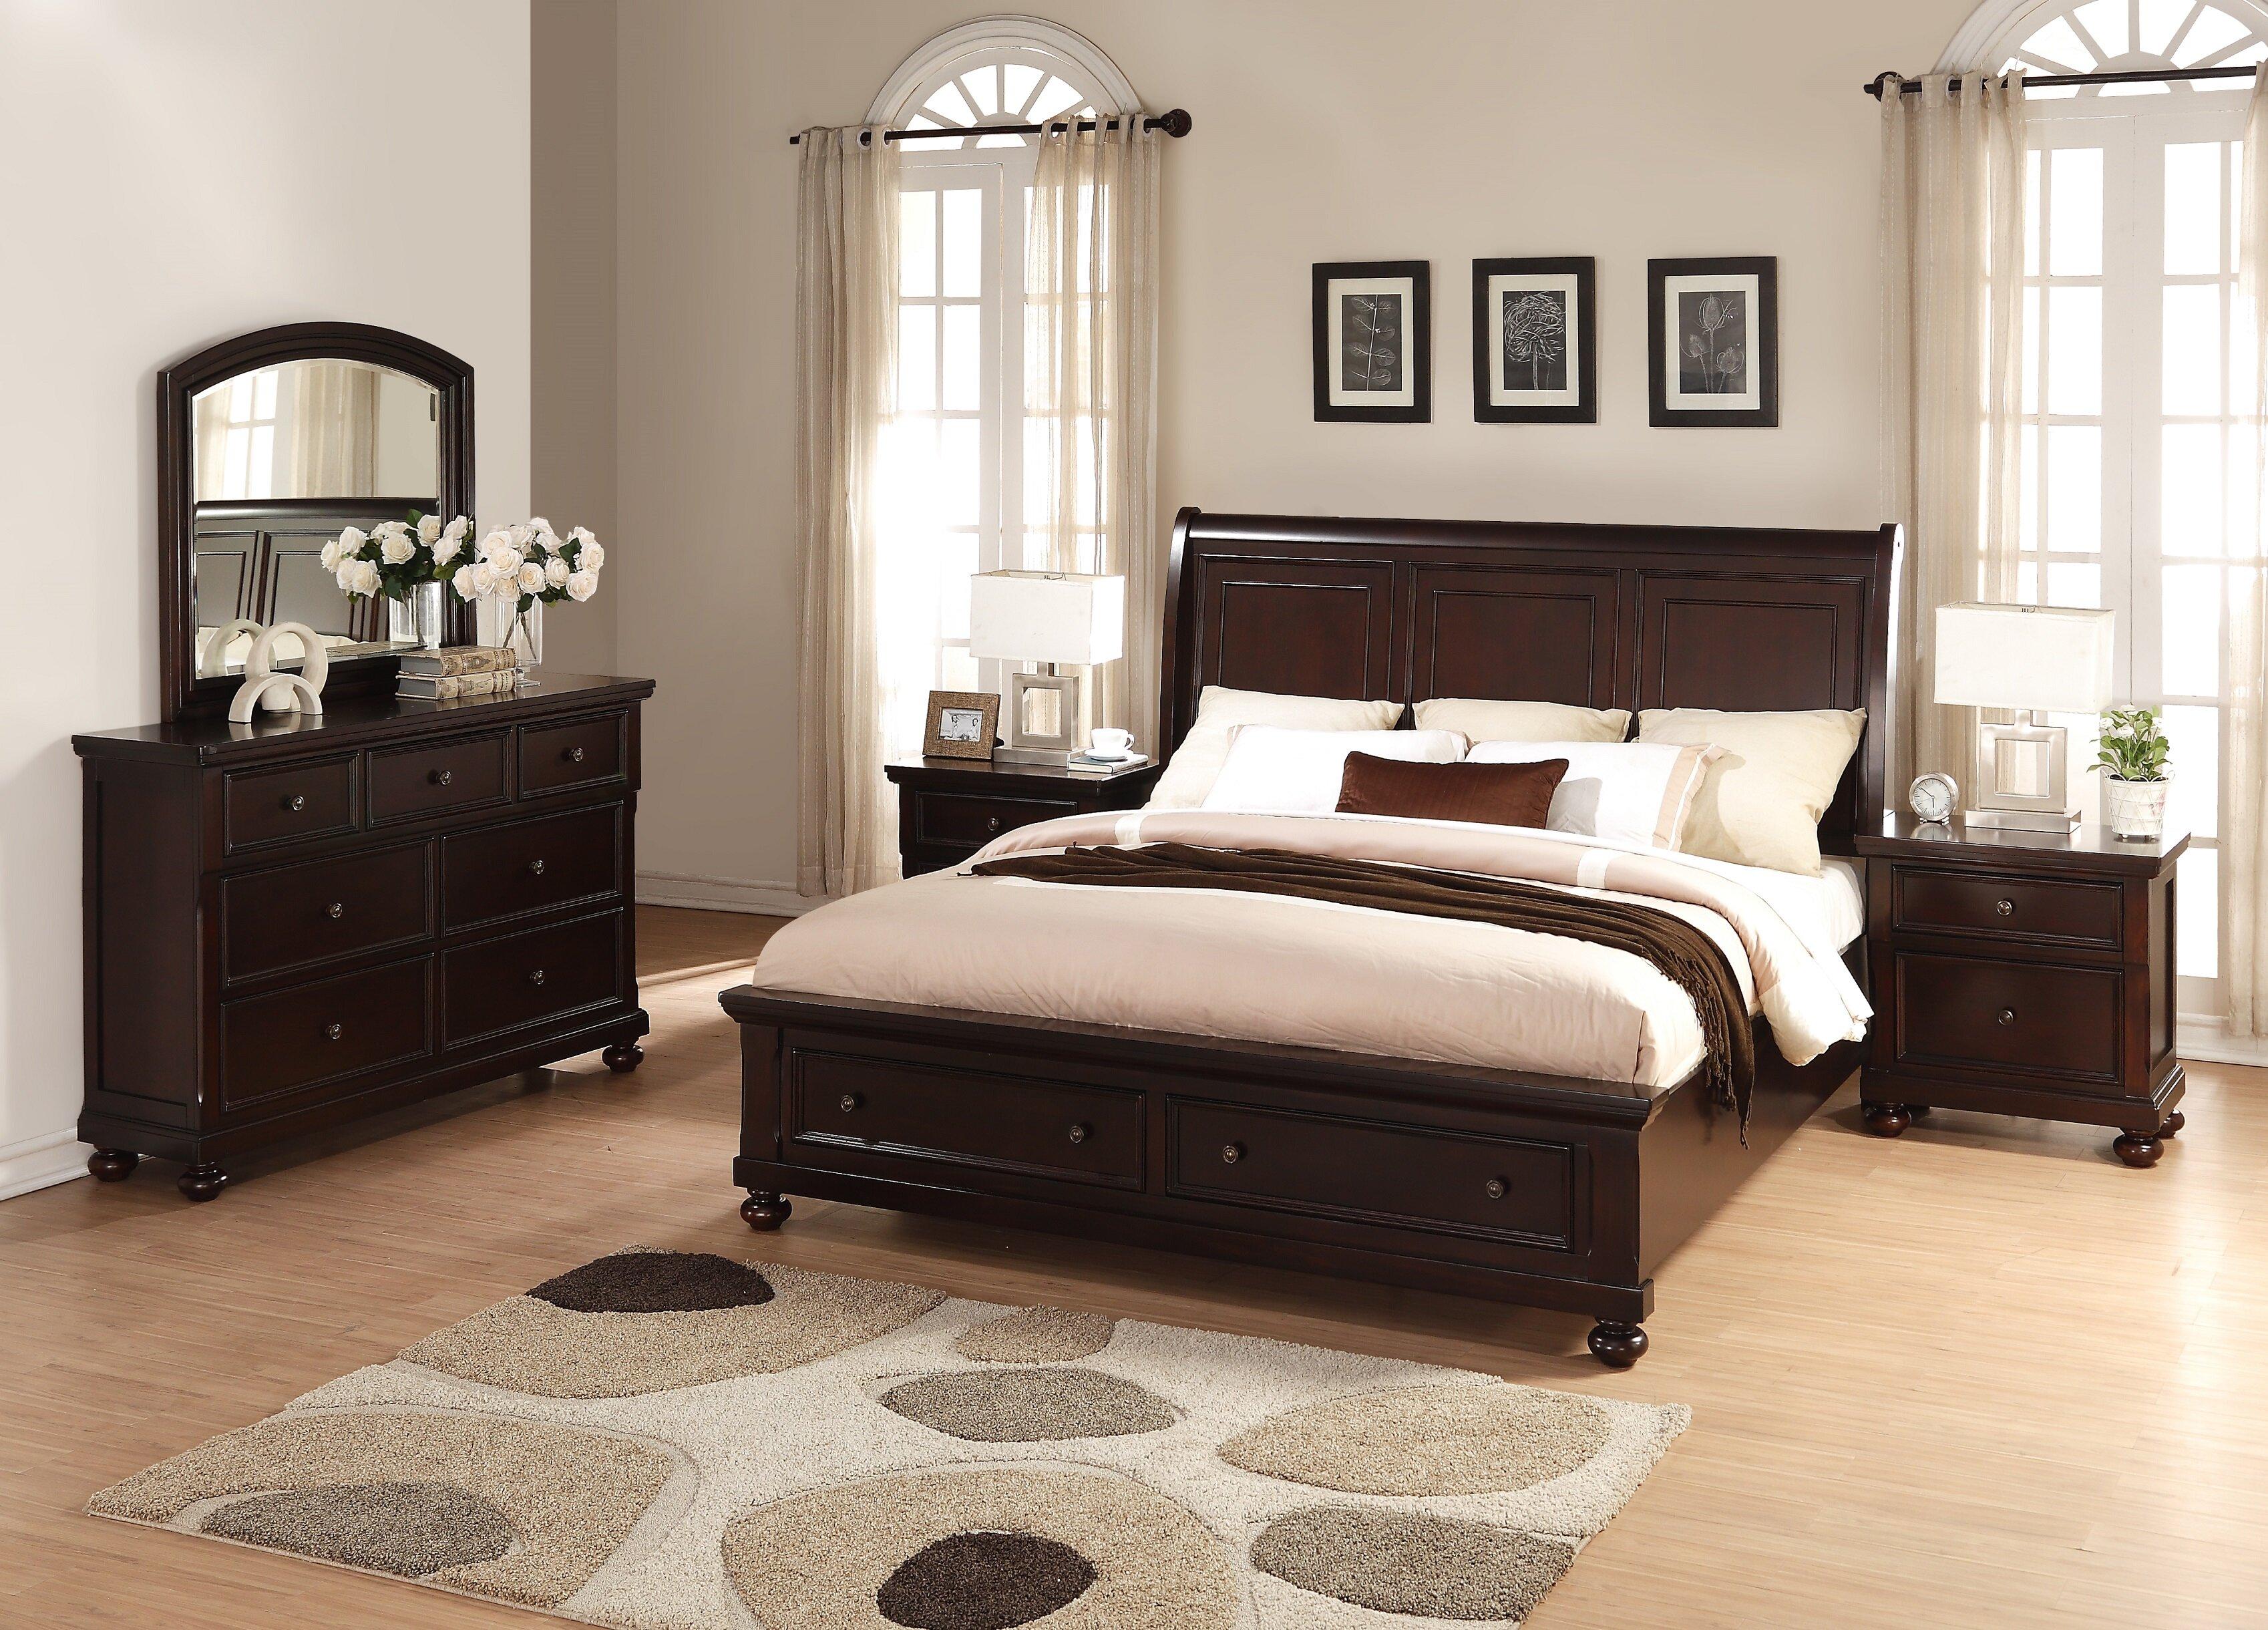 Breakwater bay jaimes king platform 5 piece bedroom set wayfair